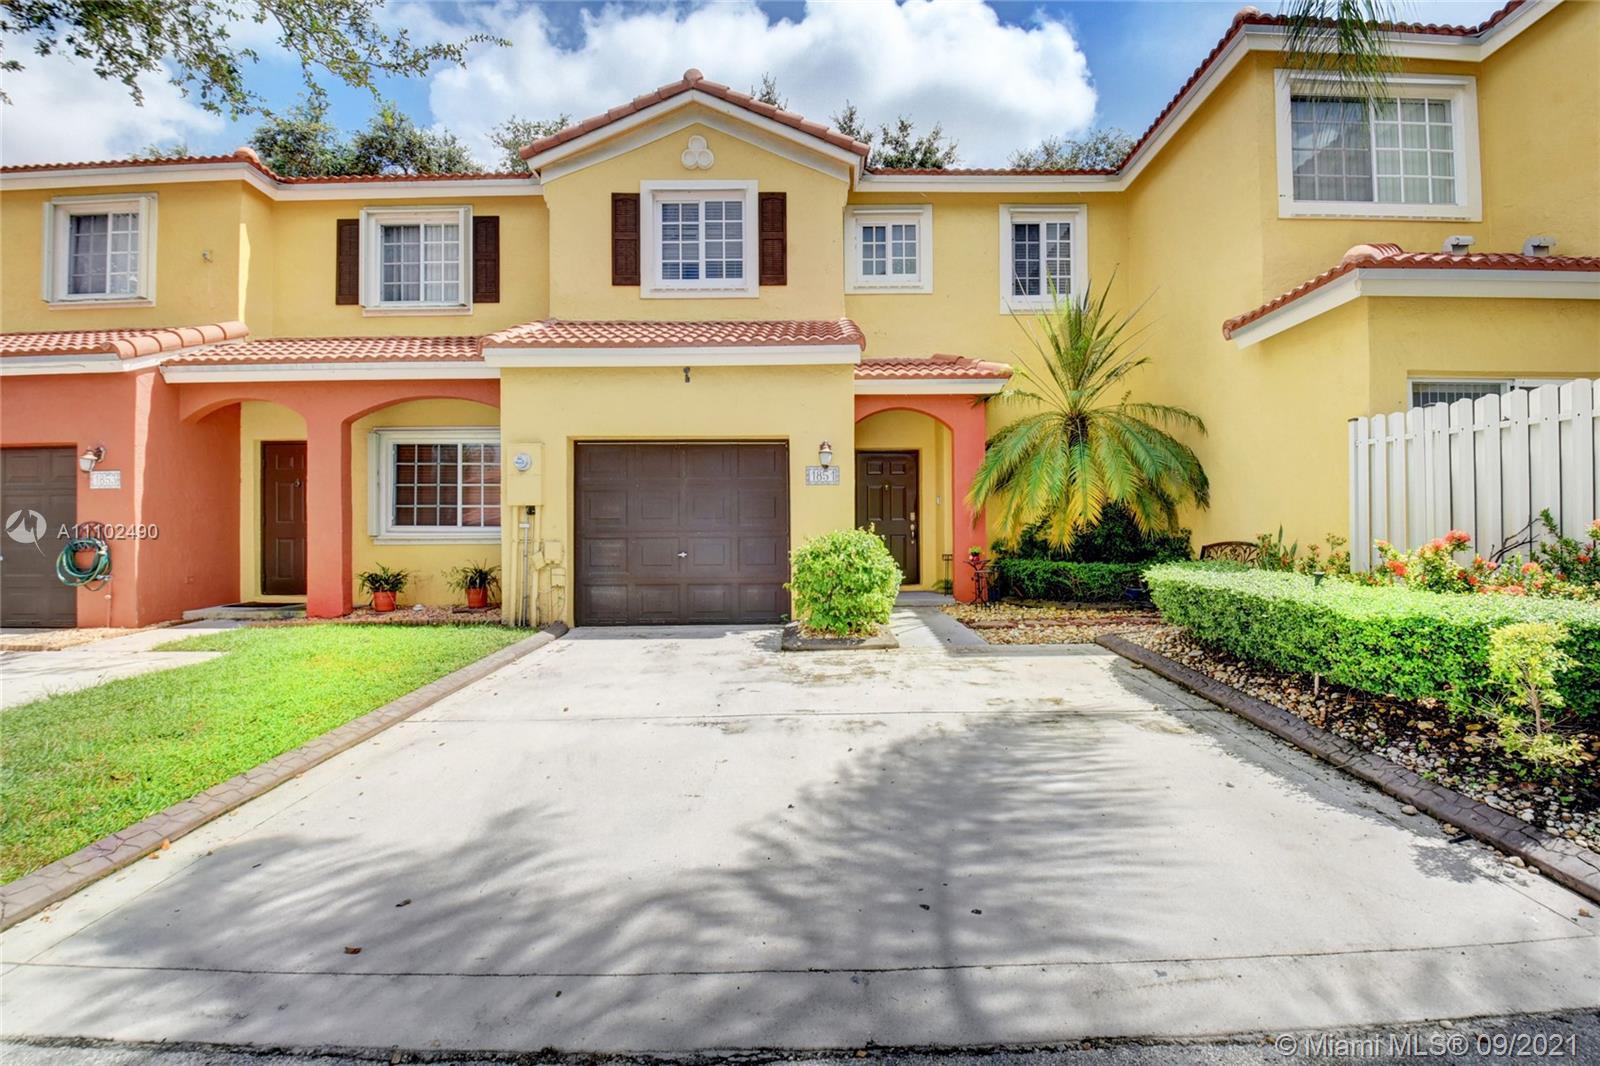 Avalon #1851 - 1851 SW 103rd Ave #1851, Miramar, FL 33025